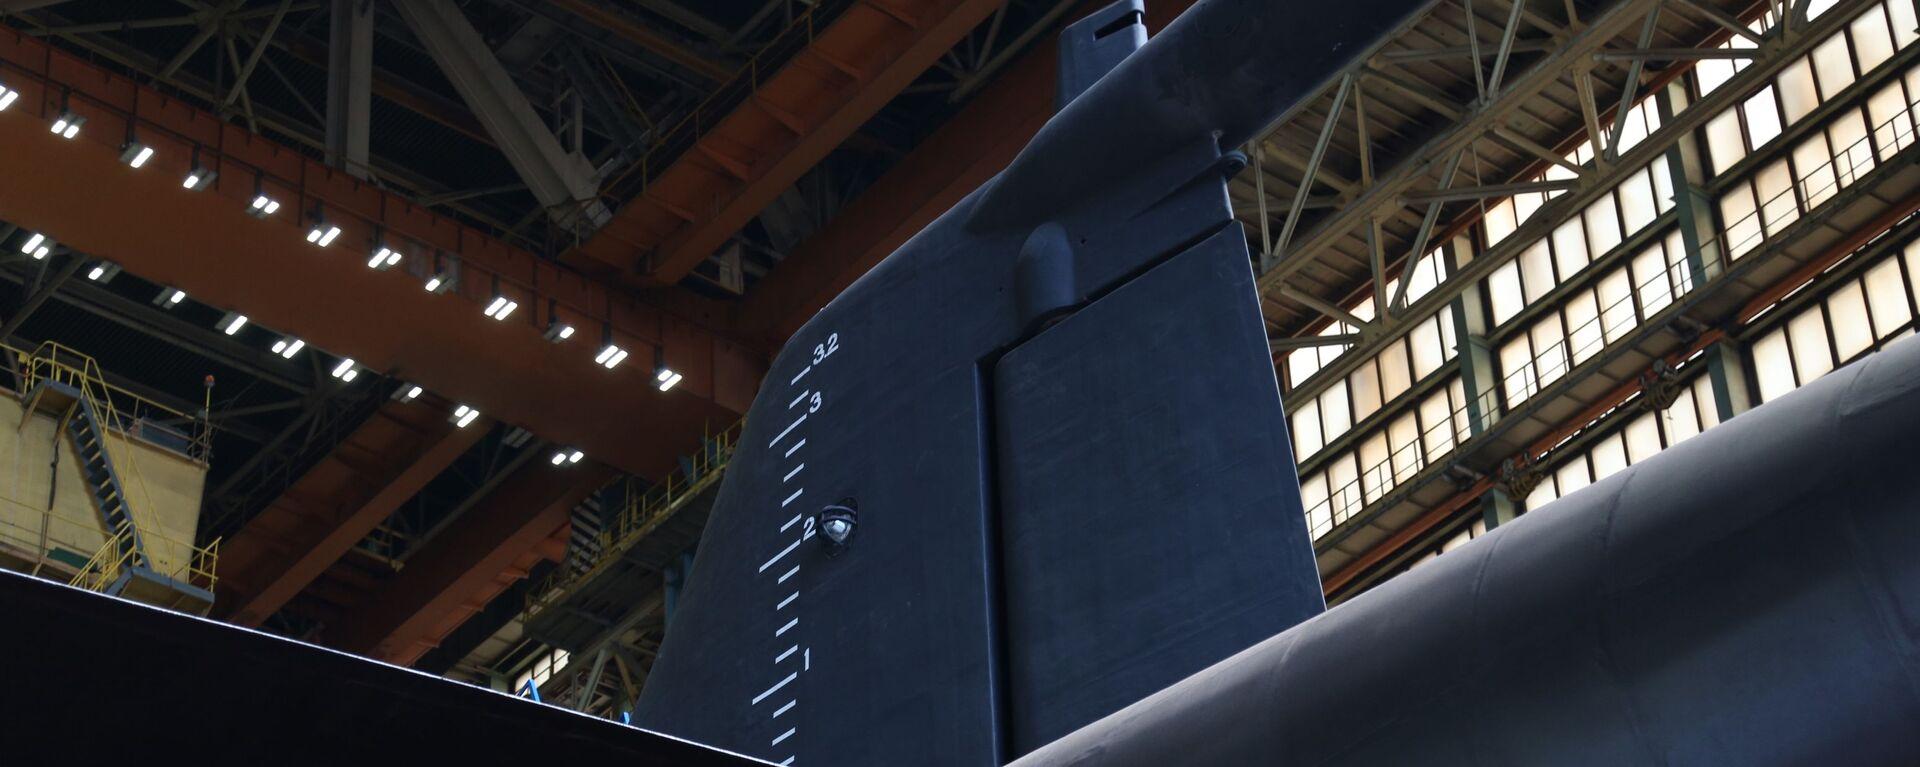 Fragmento del submarino nuclear Belgorod - Sputnik Mundo, 1920, 14.02.2021